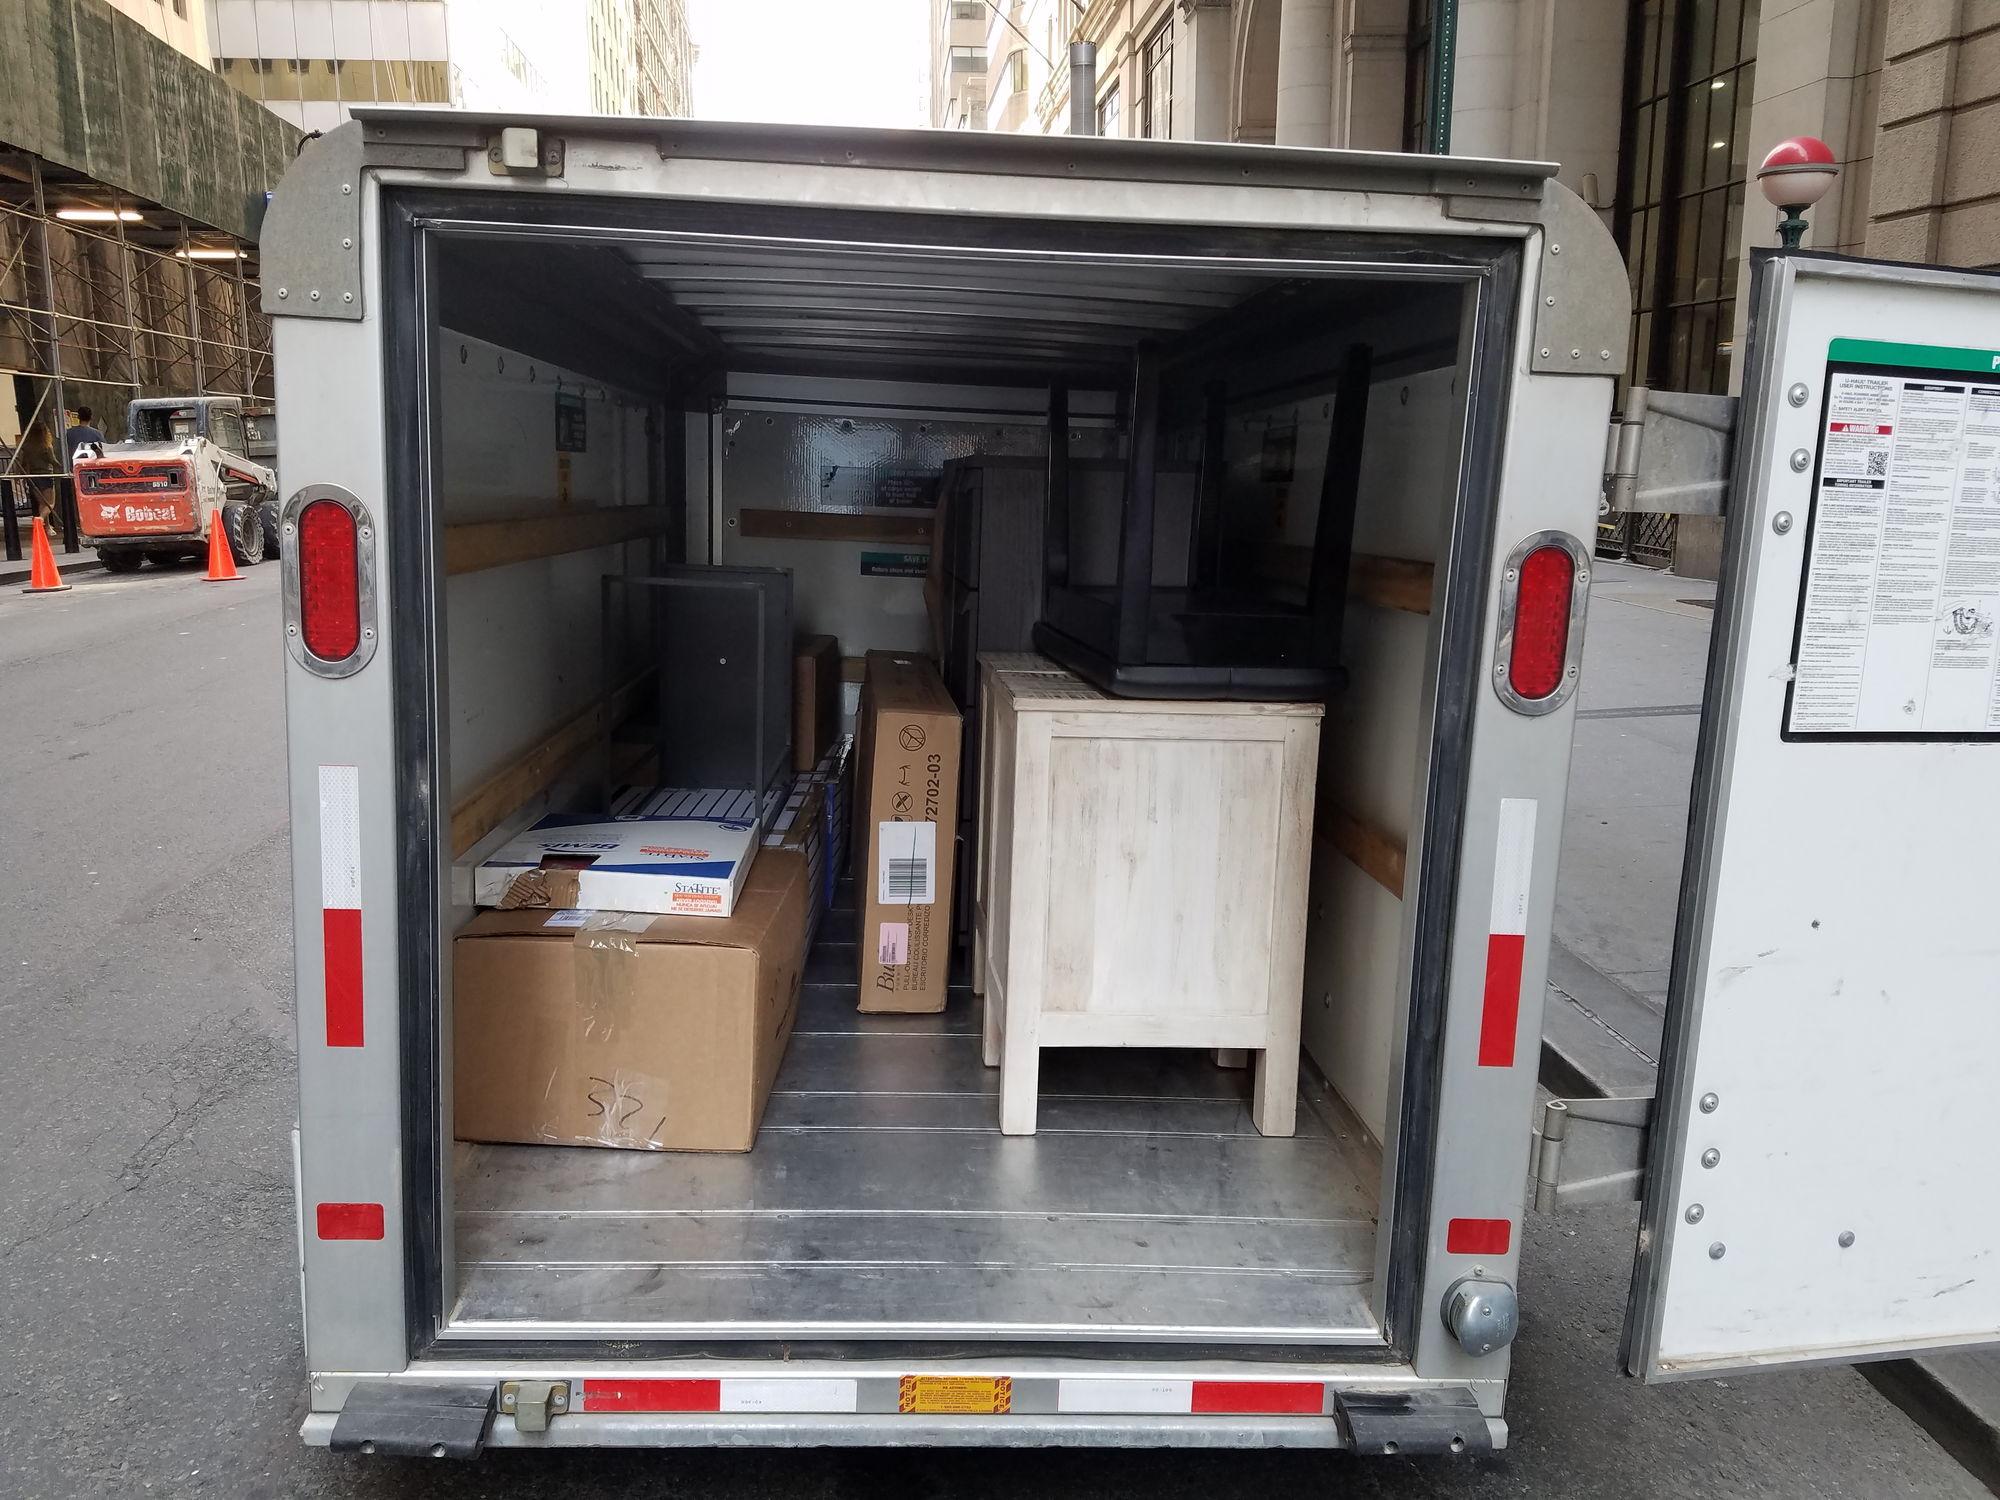 80-20160528_095615_6bd07f00b66843e2702f5850976061c312c31727 U Haul Trailer Hitch Wiring Harness on camper wiring harness, u-haul wiring adapter, u-haul wiring harness diagram, u-haul trailer wiring kit, diesel wiring harness, toyota wiring harness, u-haul trailer light harness,